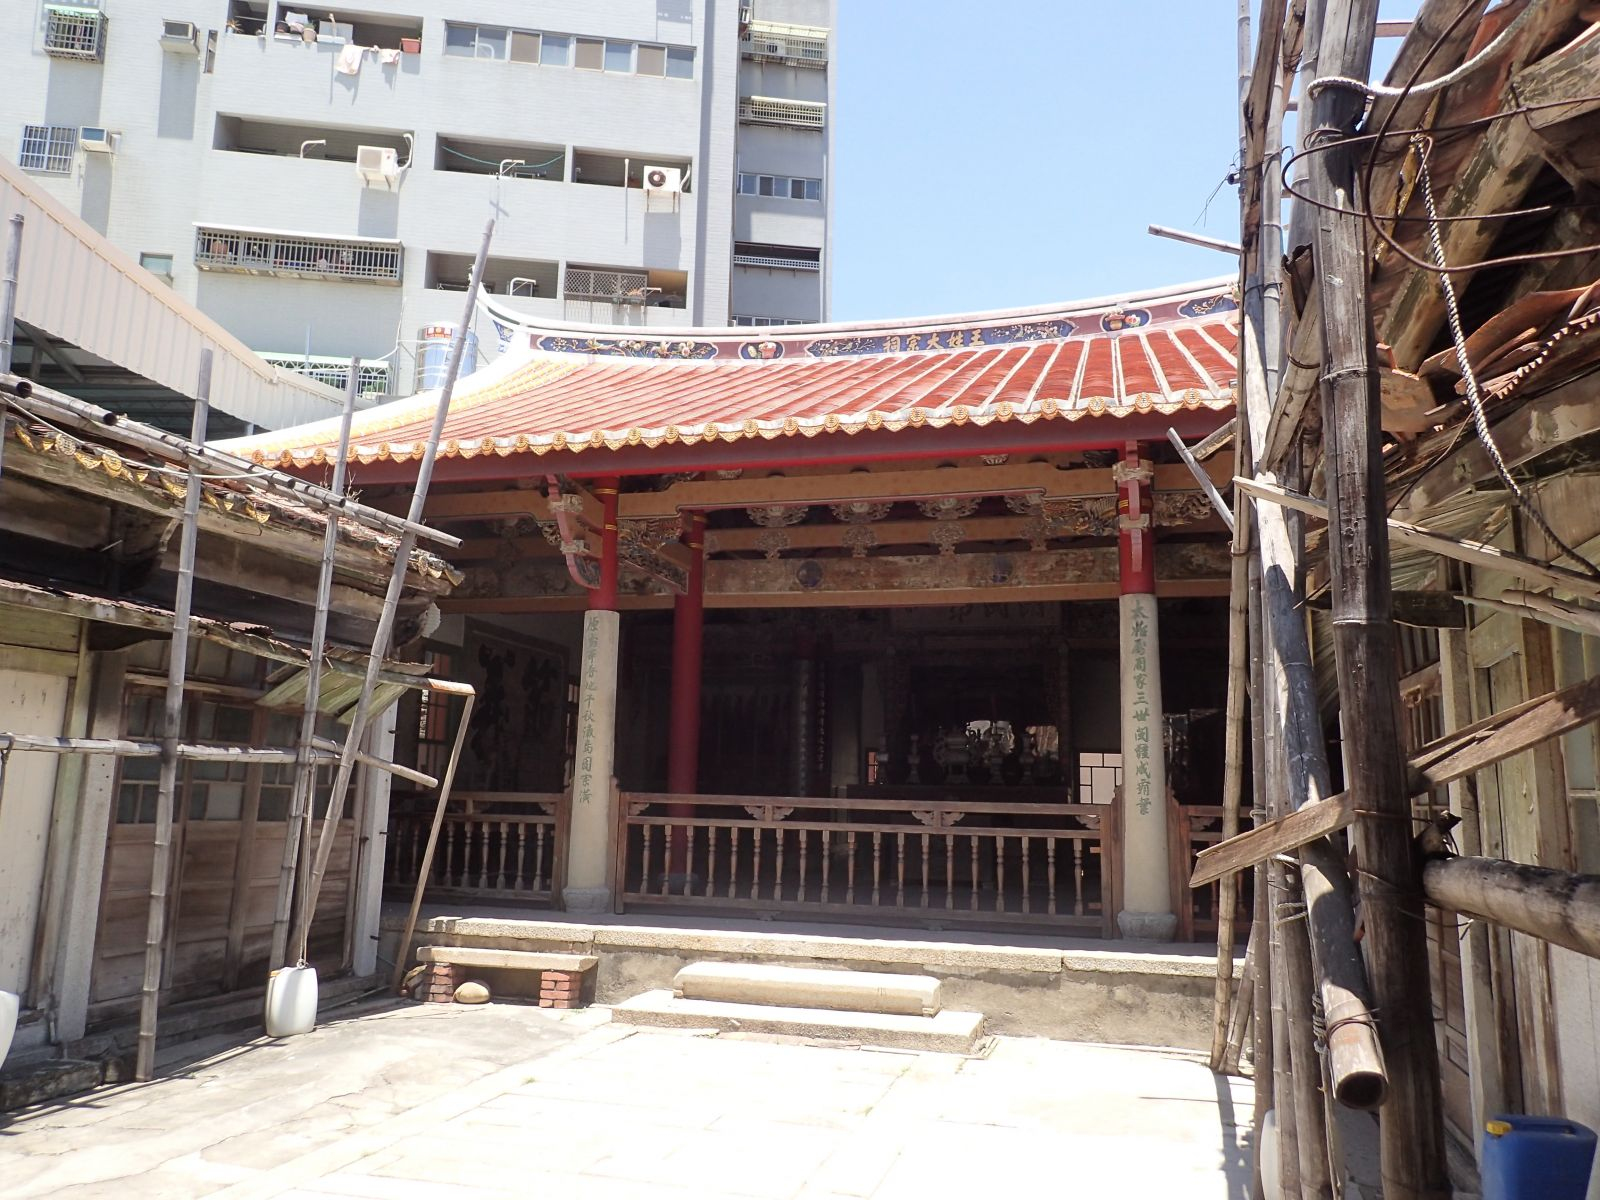 Wang family temple historic building restoration